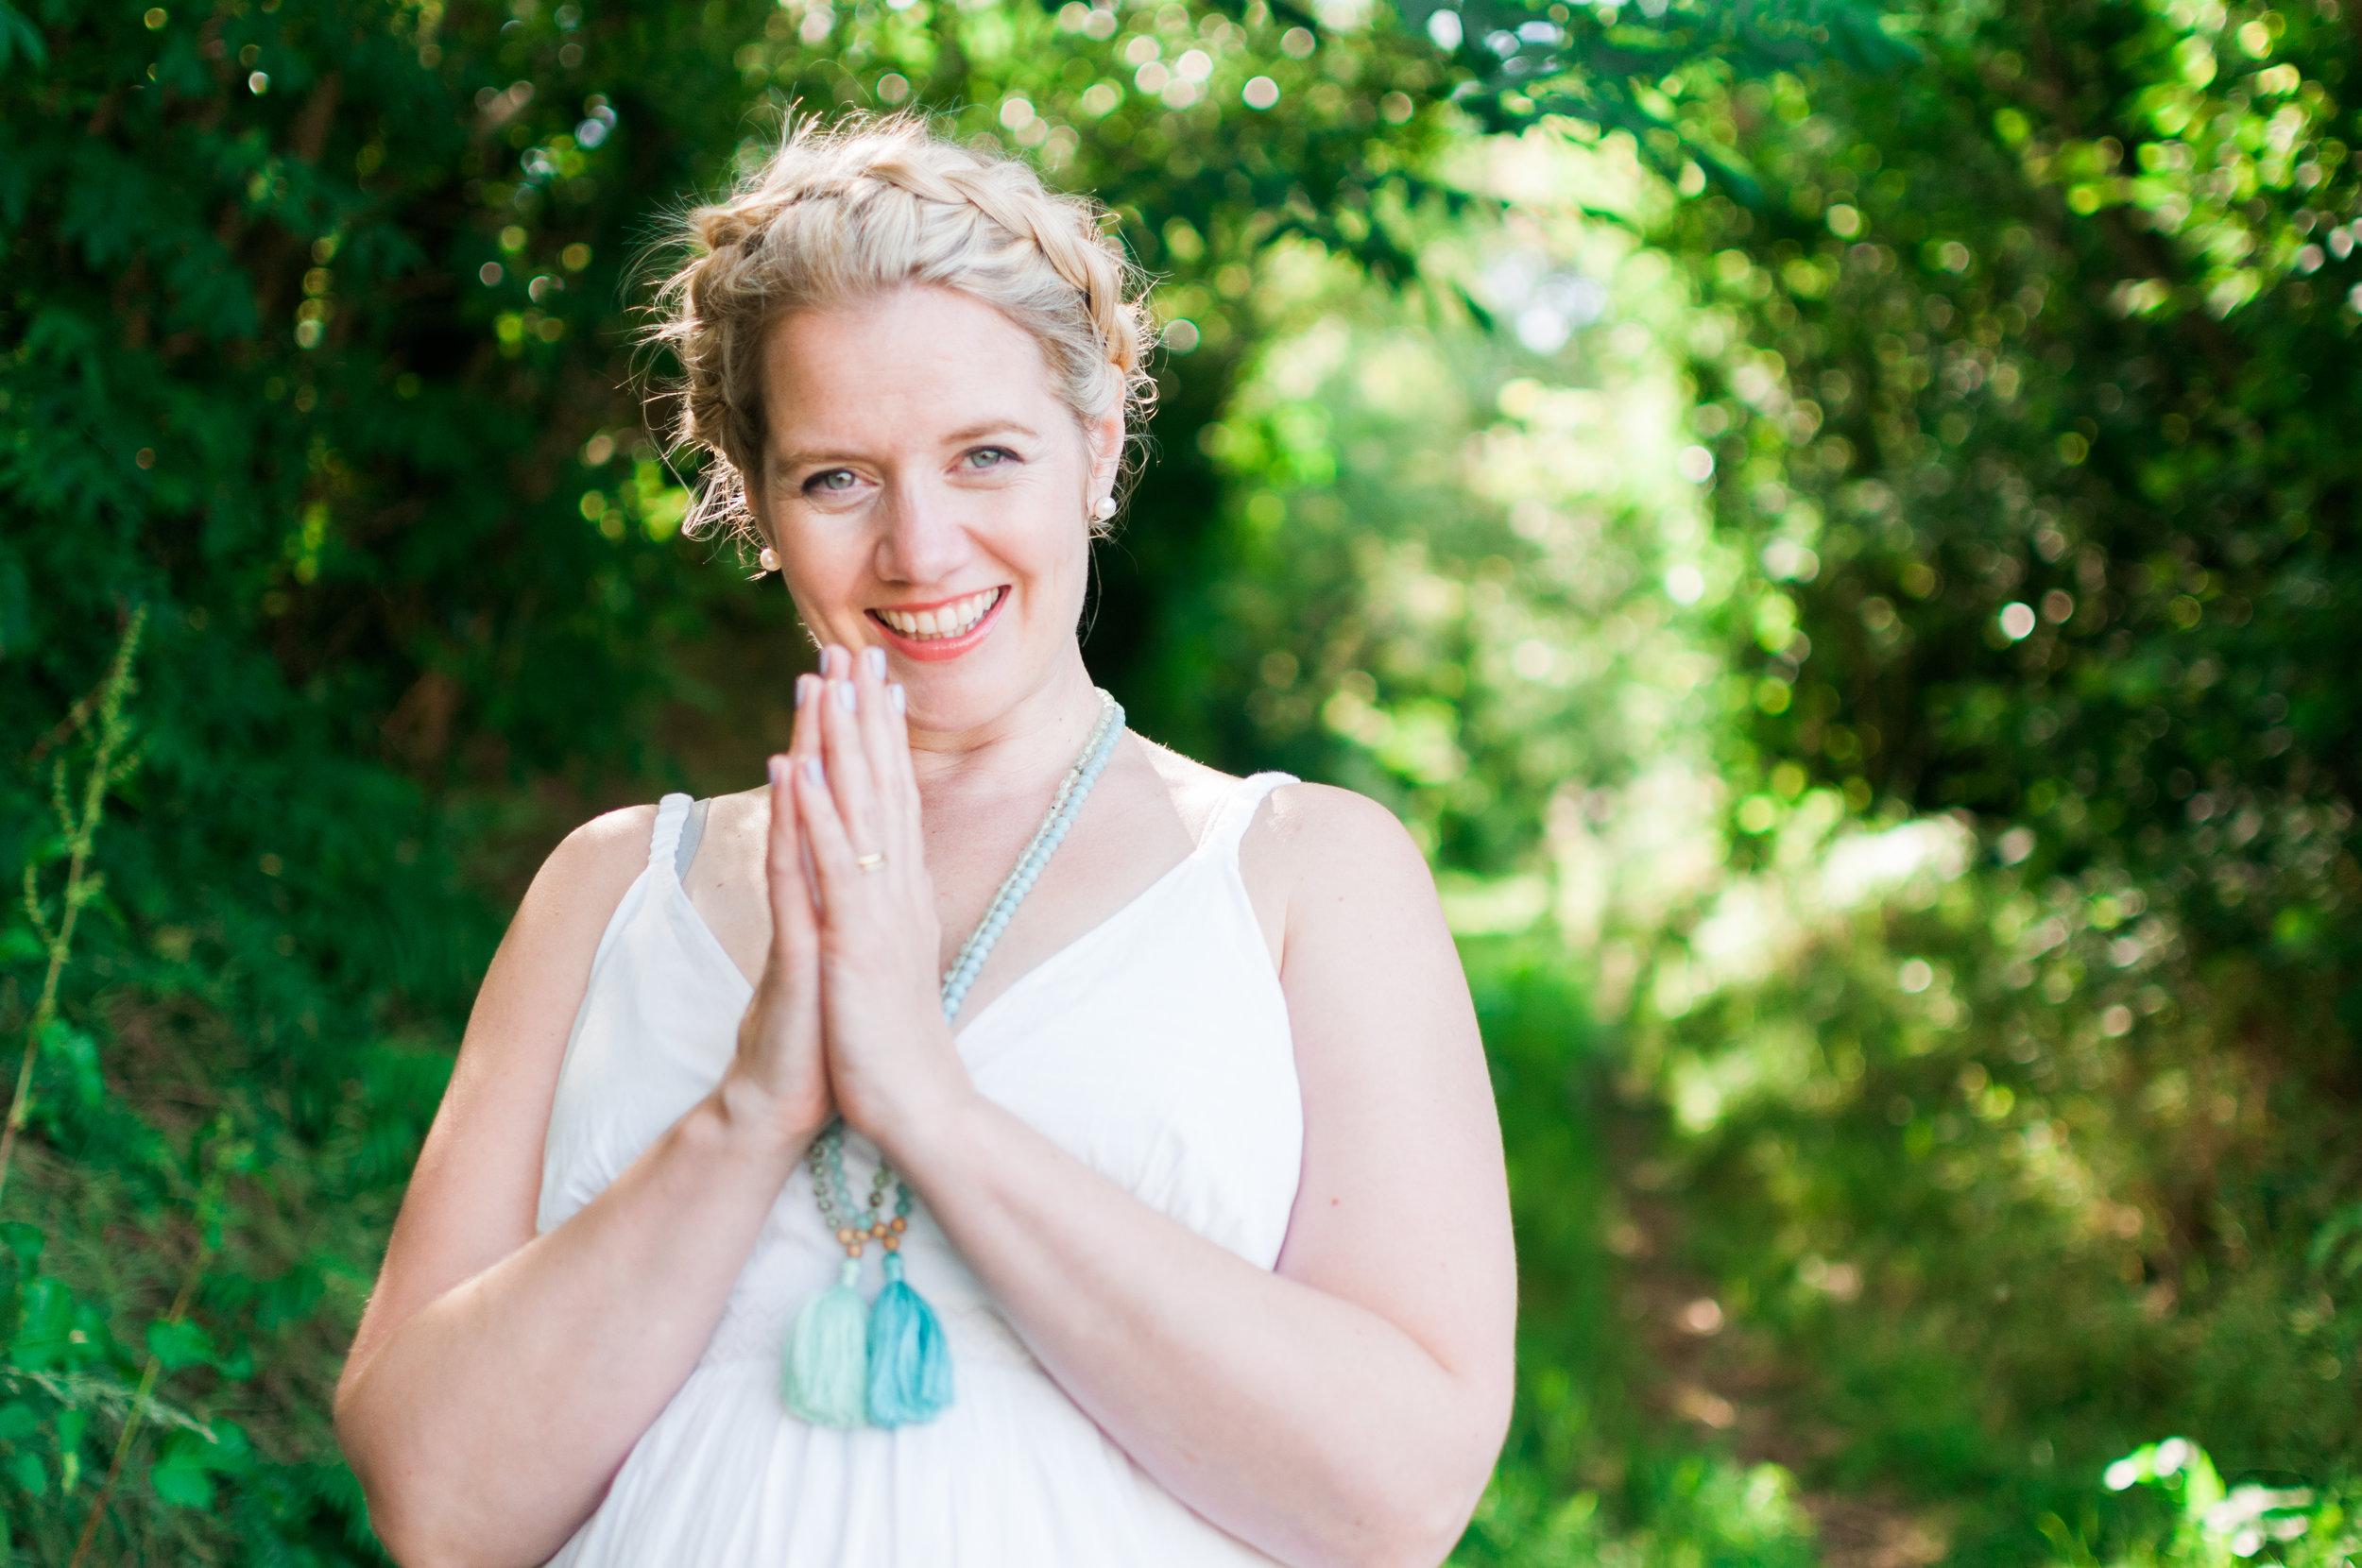 Rachel Yoga Teacher Photography Branding Becky Rui Somerset Devon